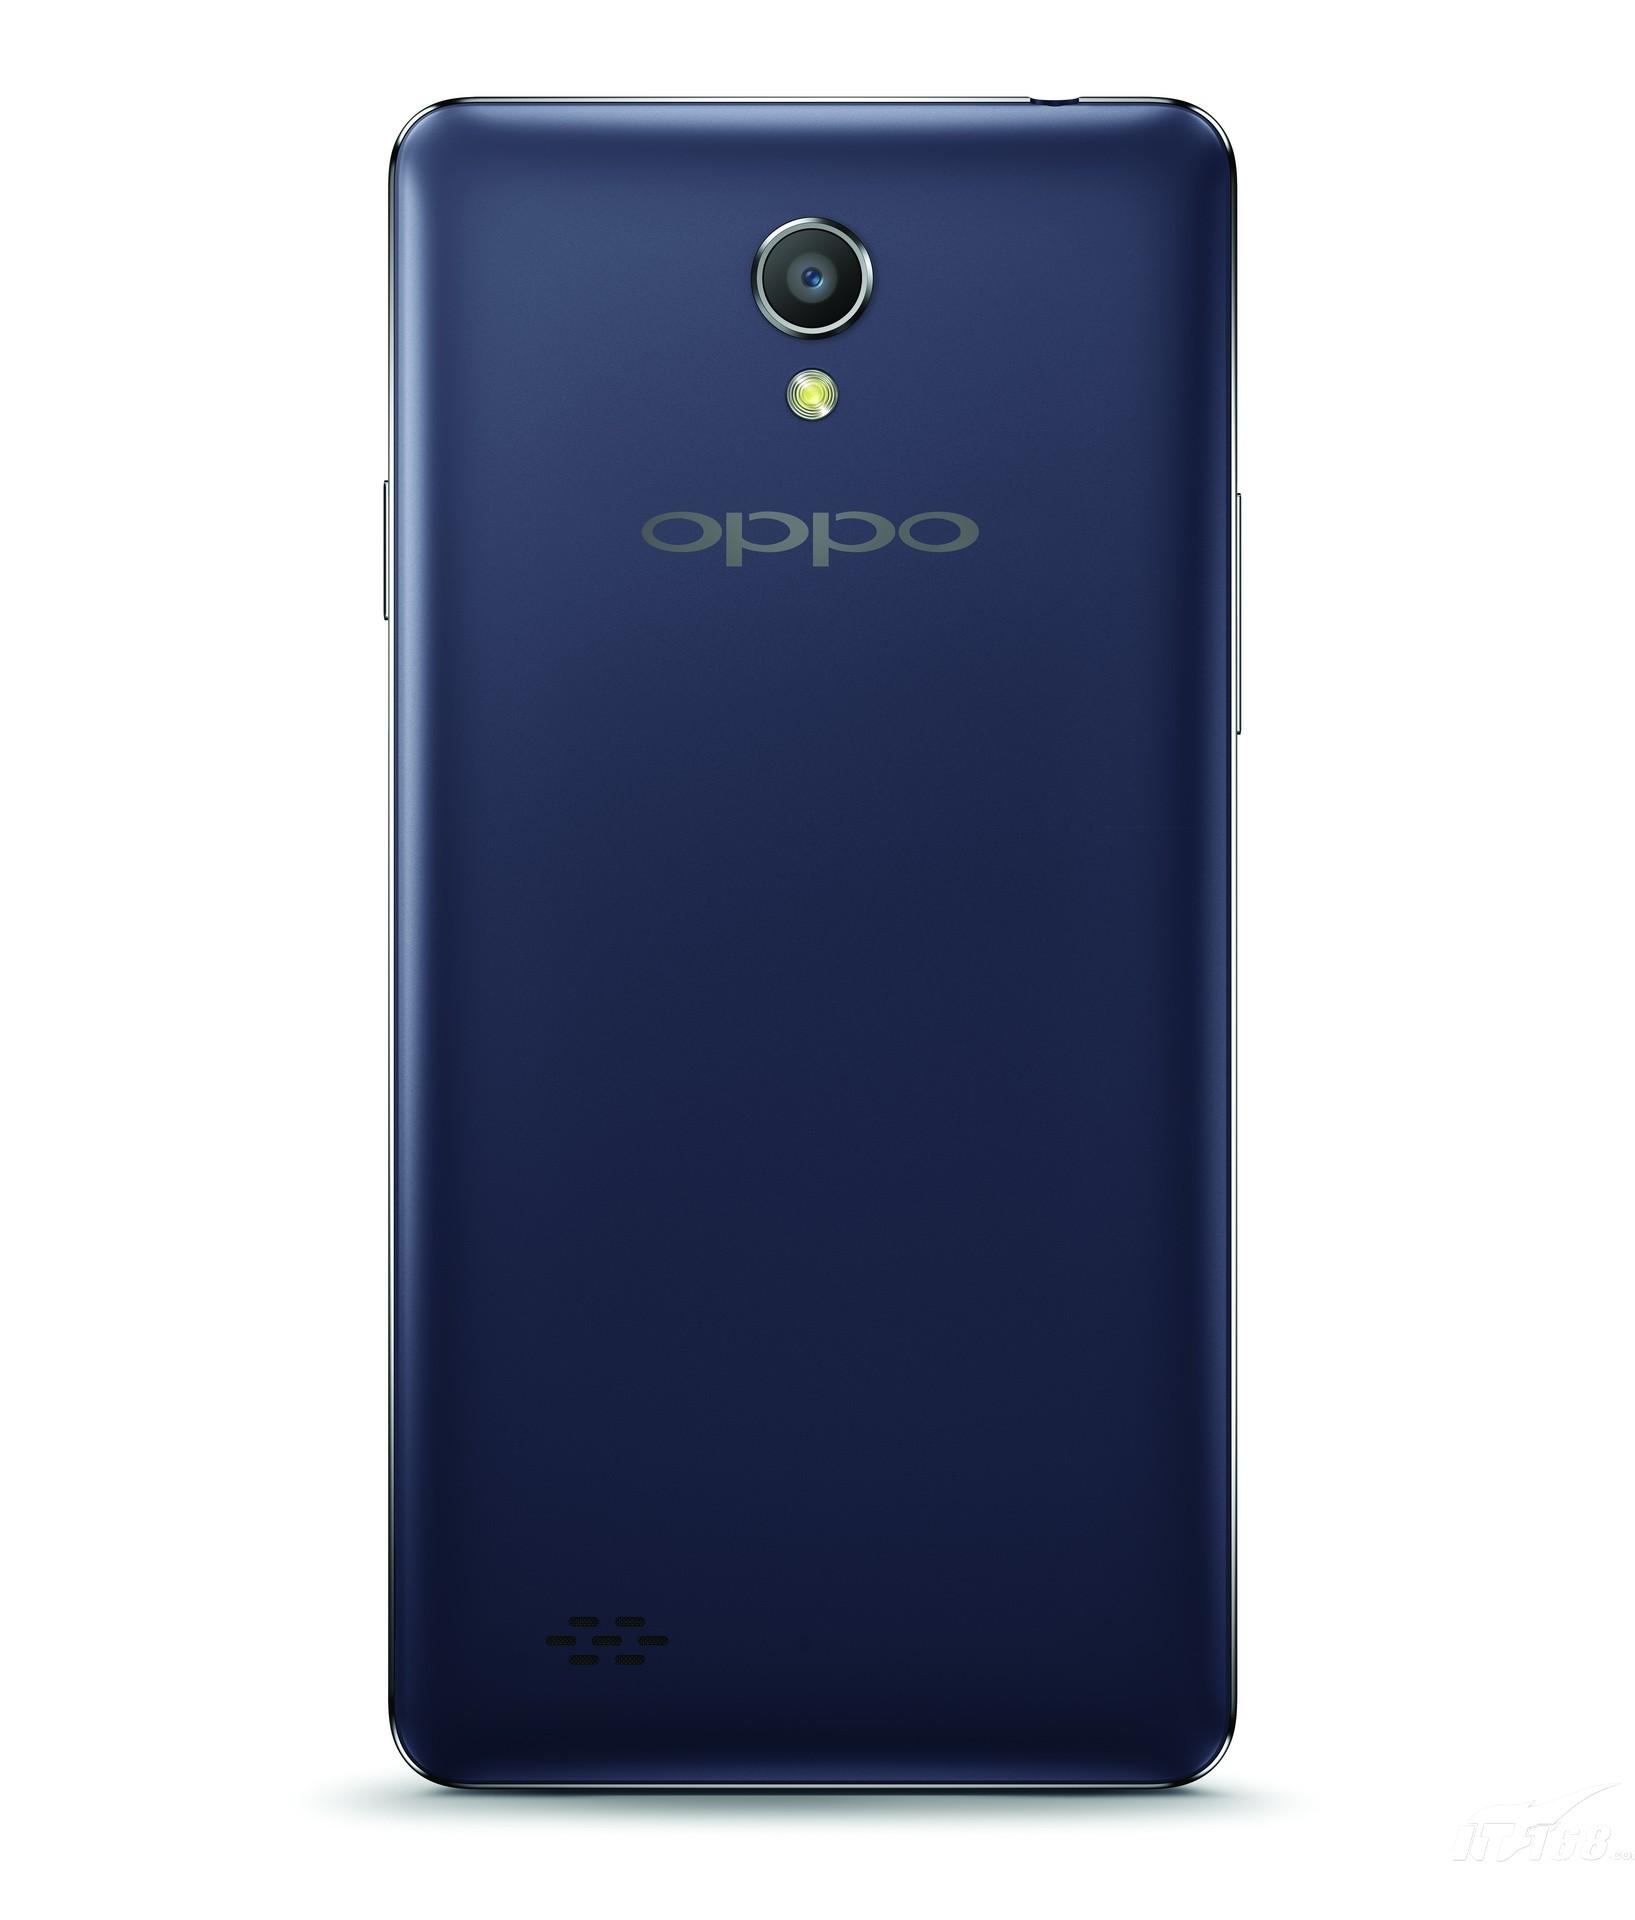 oppoa11 移动4g版 黑色手机产品图片2素材-it168手机